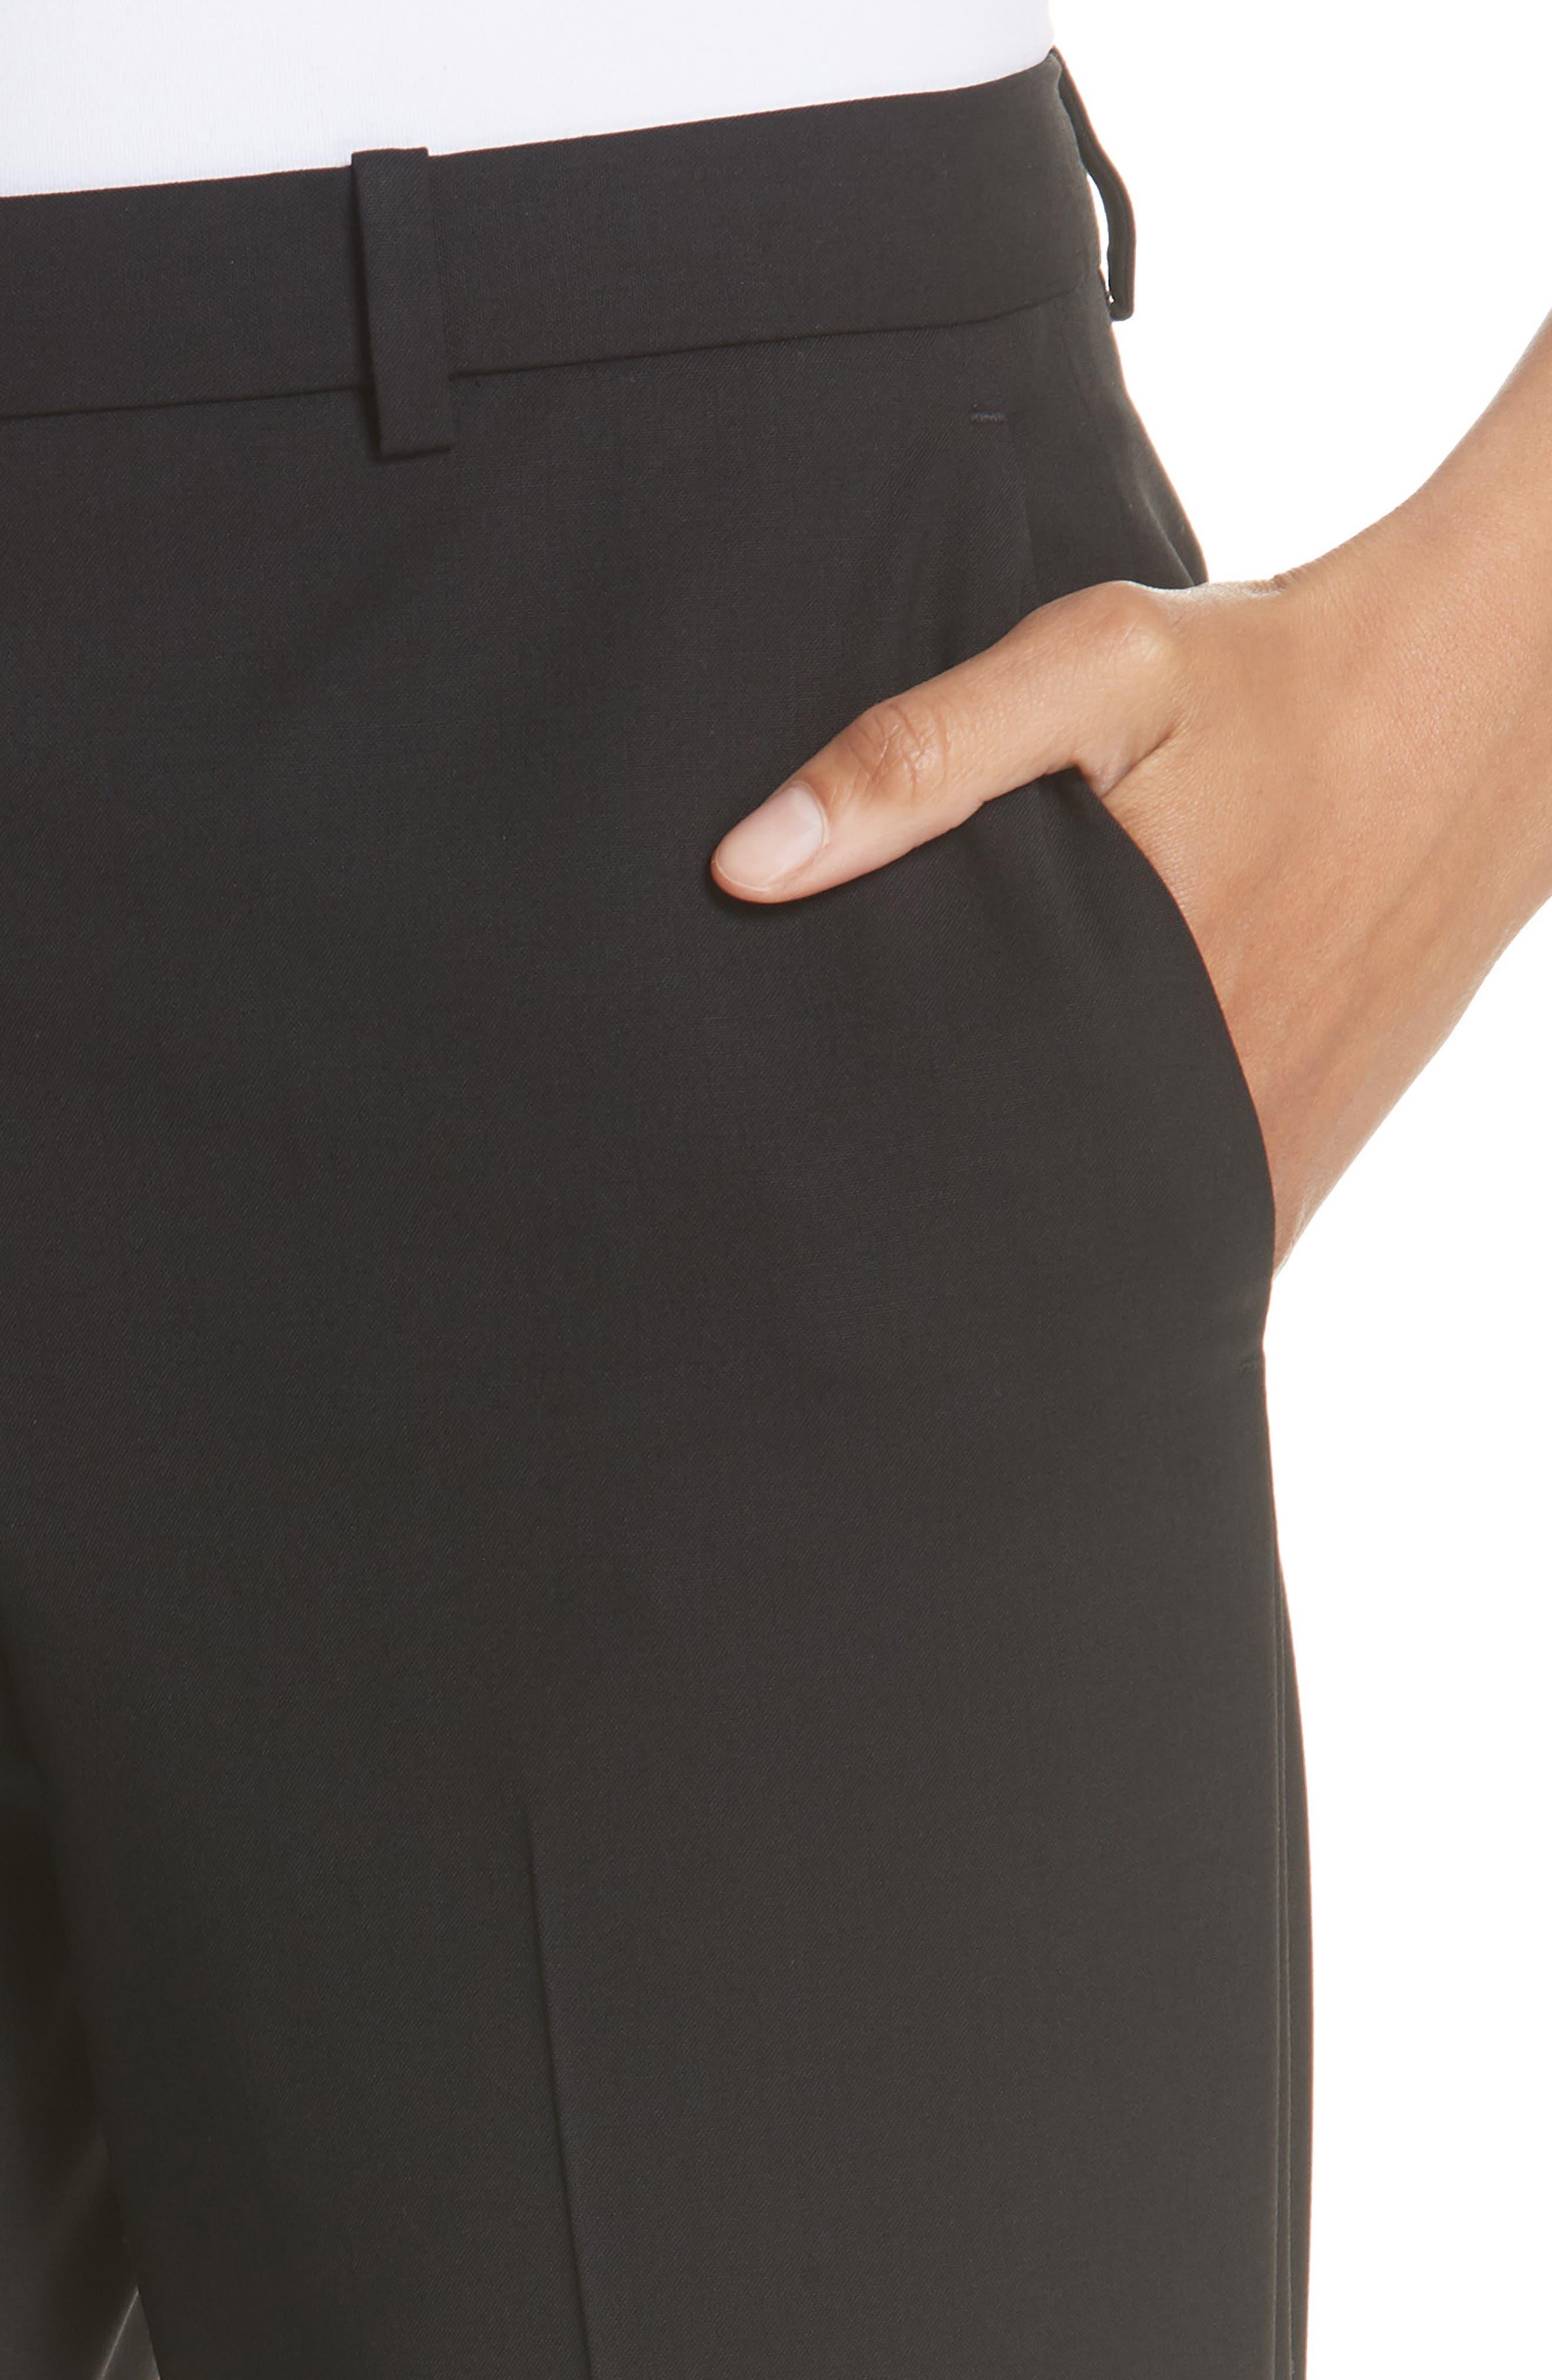 Demitria 2 Stretch Wool Suit Pants,                             Alternate thumbnail 4, color,                             Black